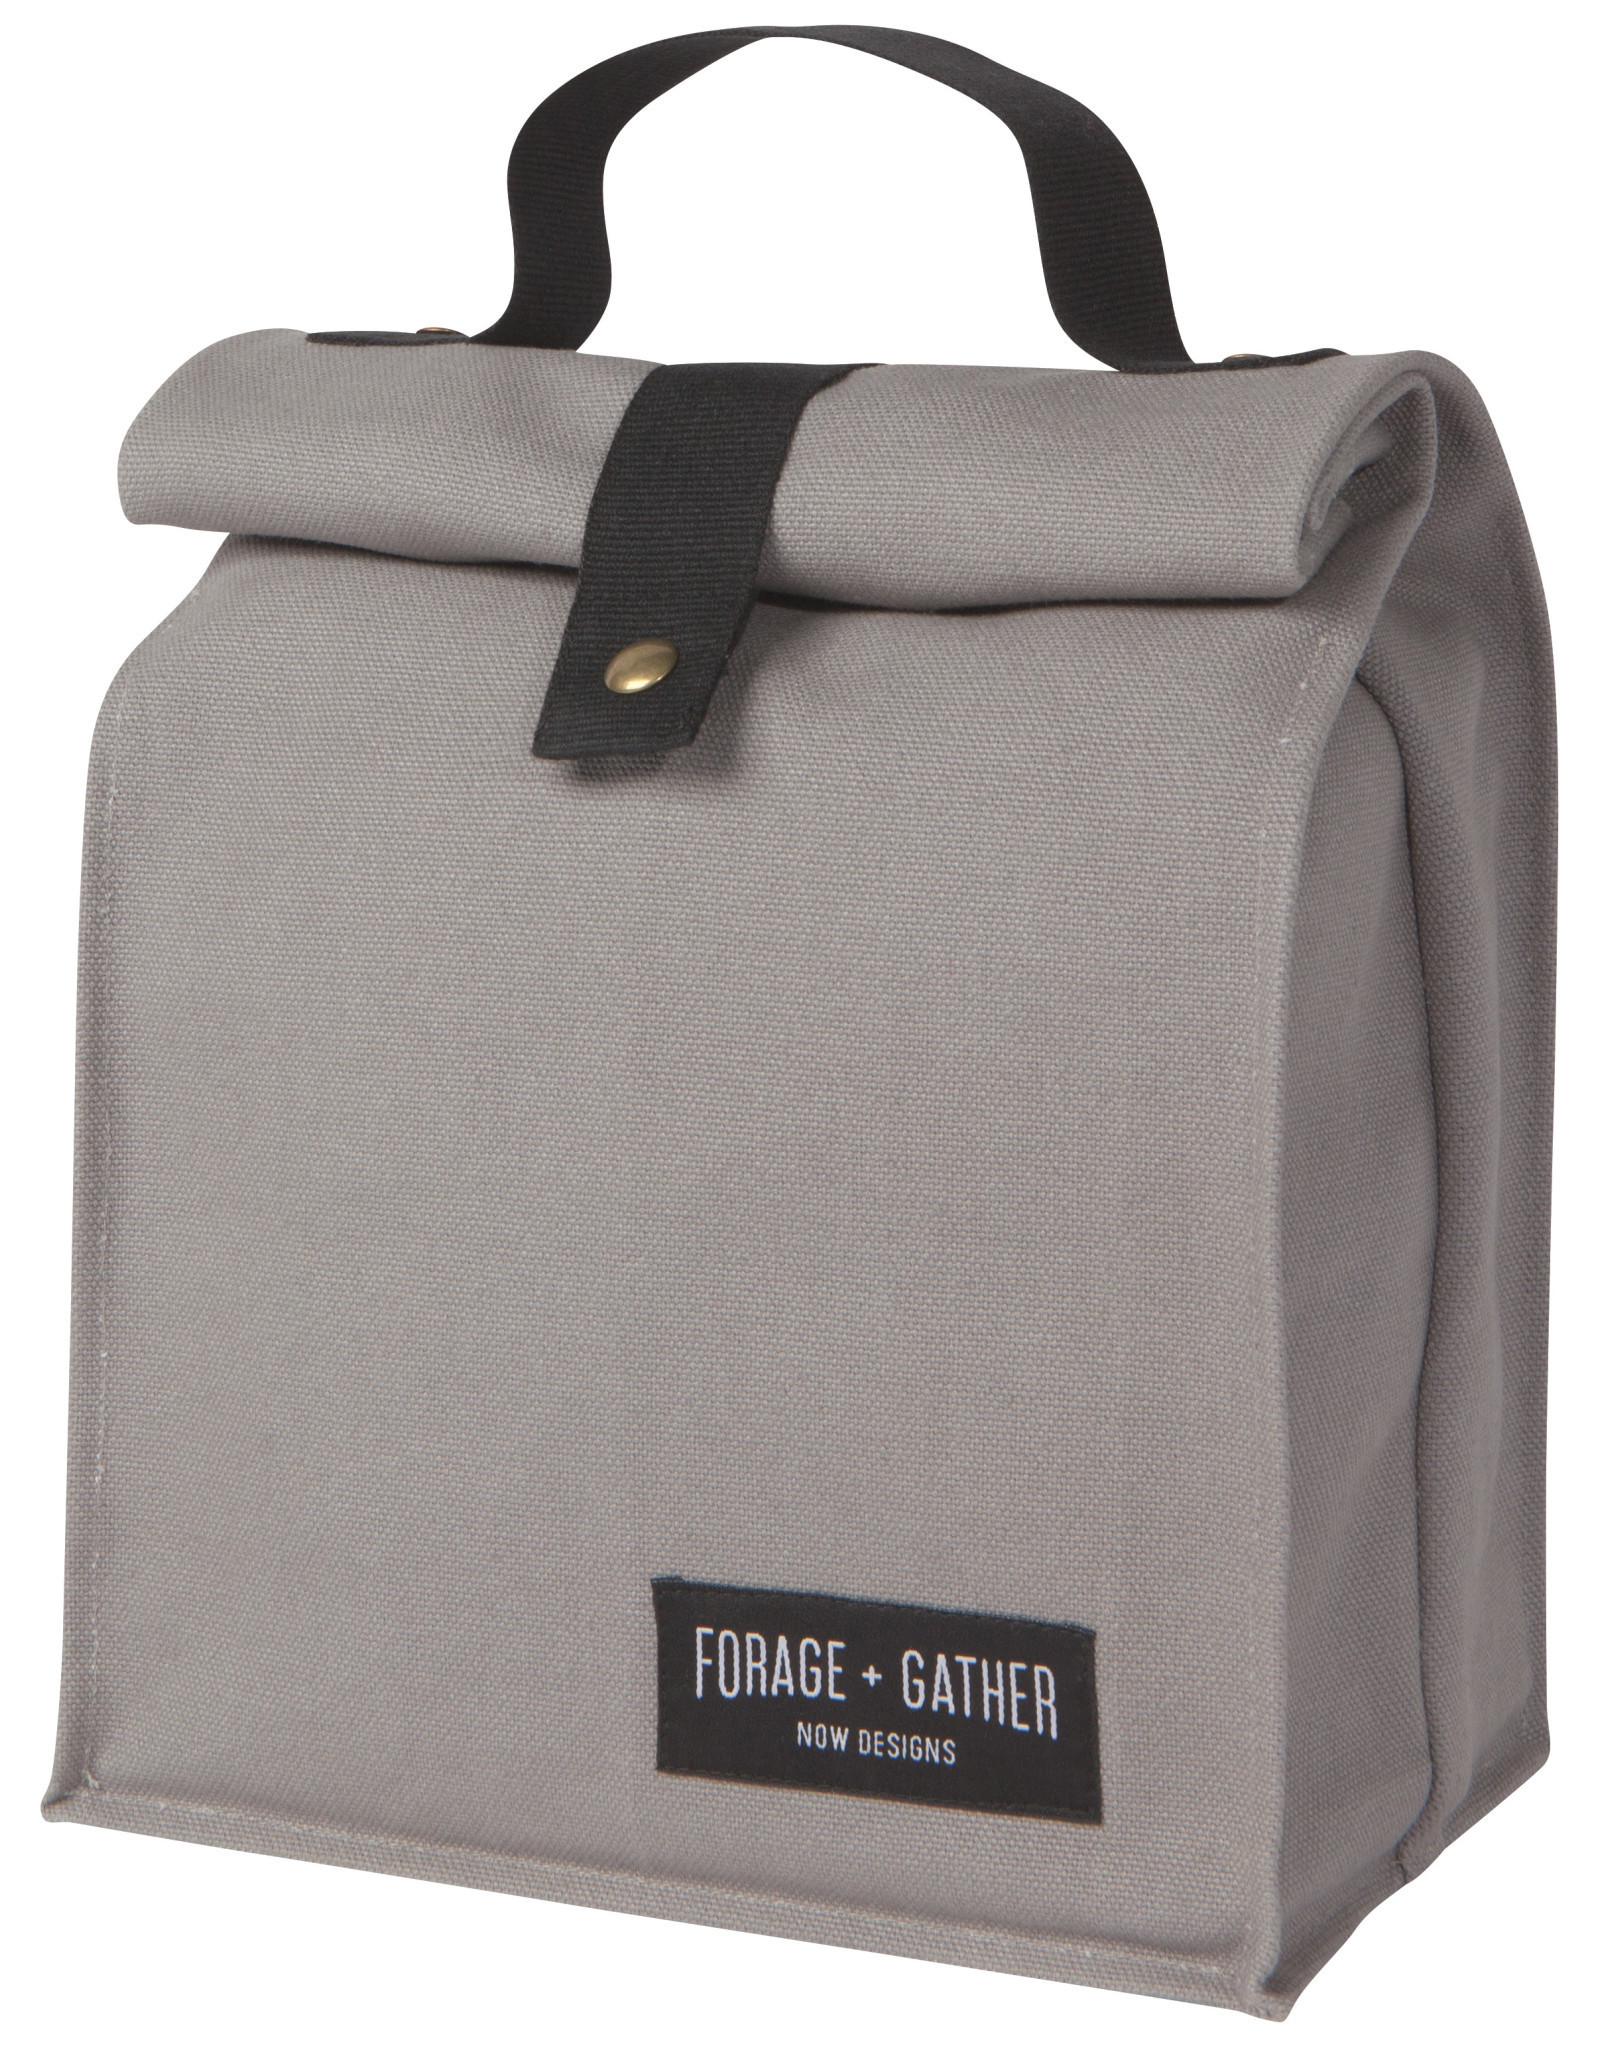 Danica - Forage + Gather Lunch Bag - Gray